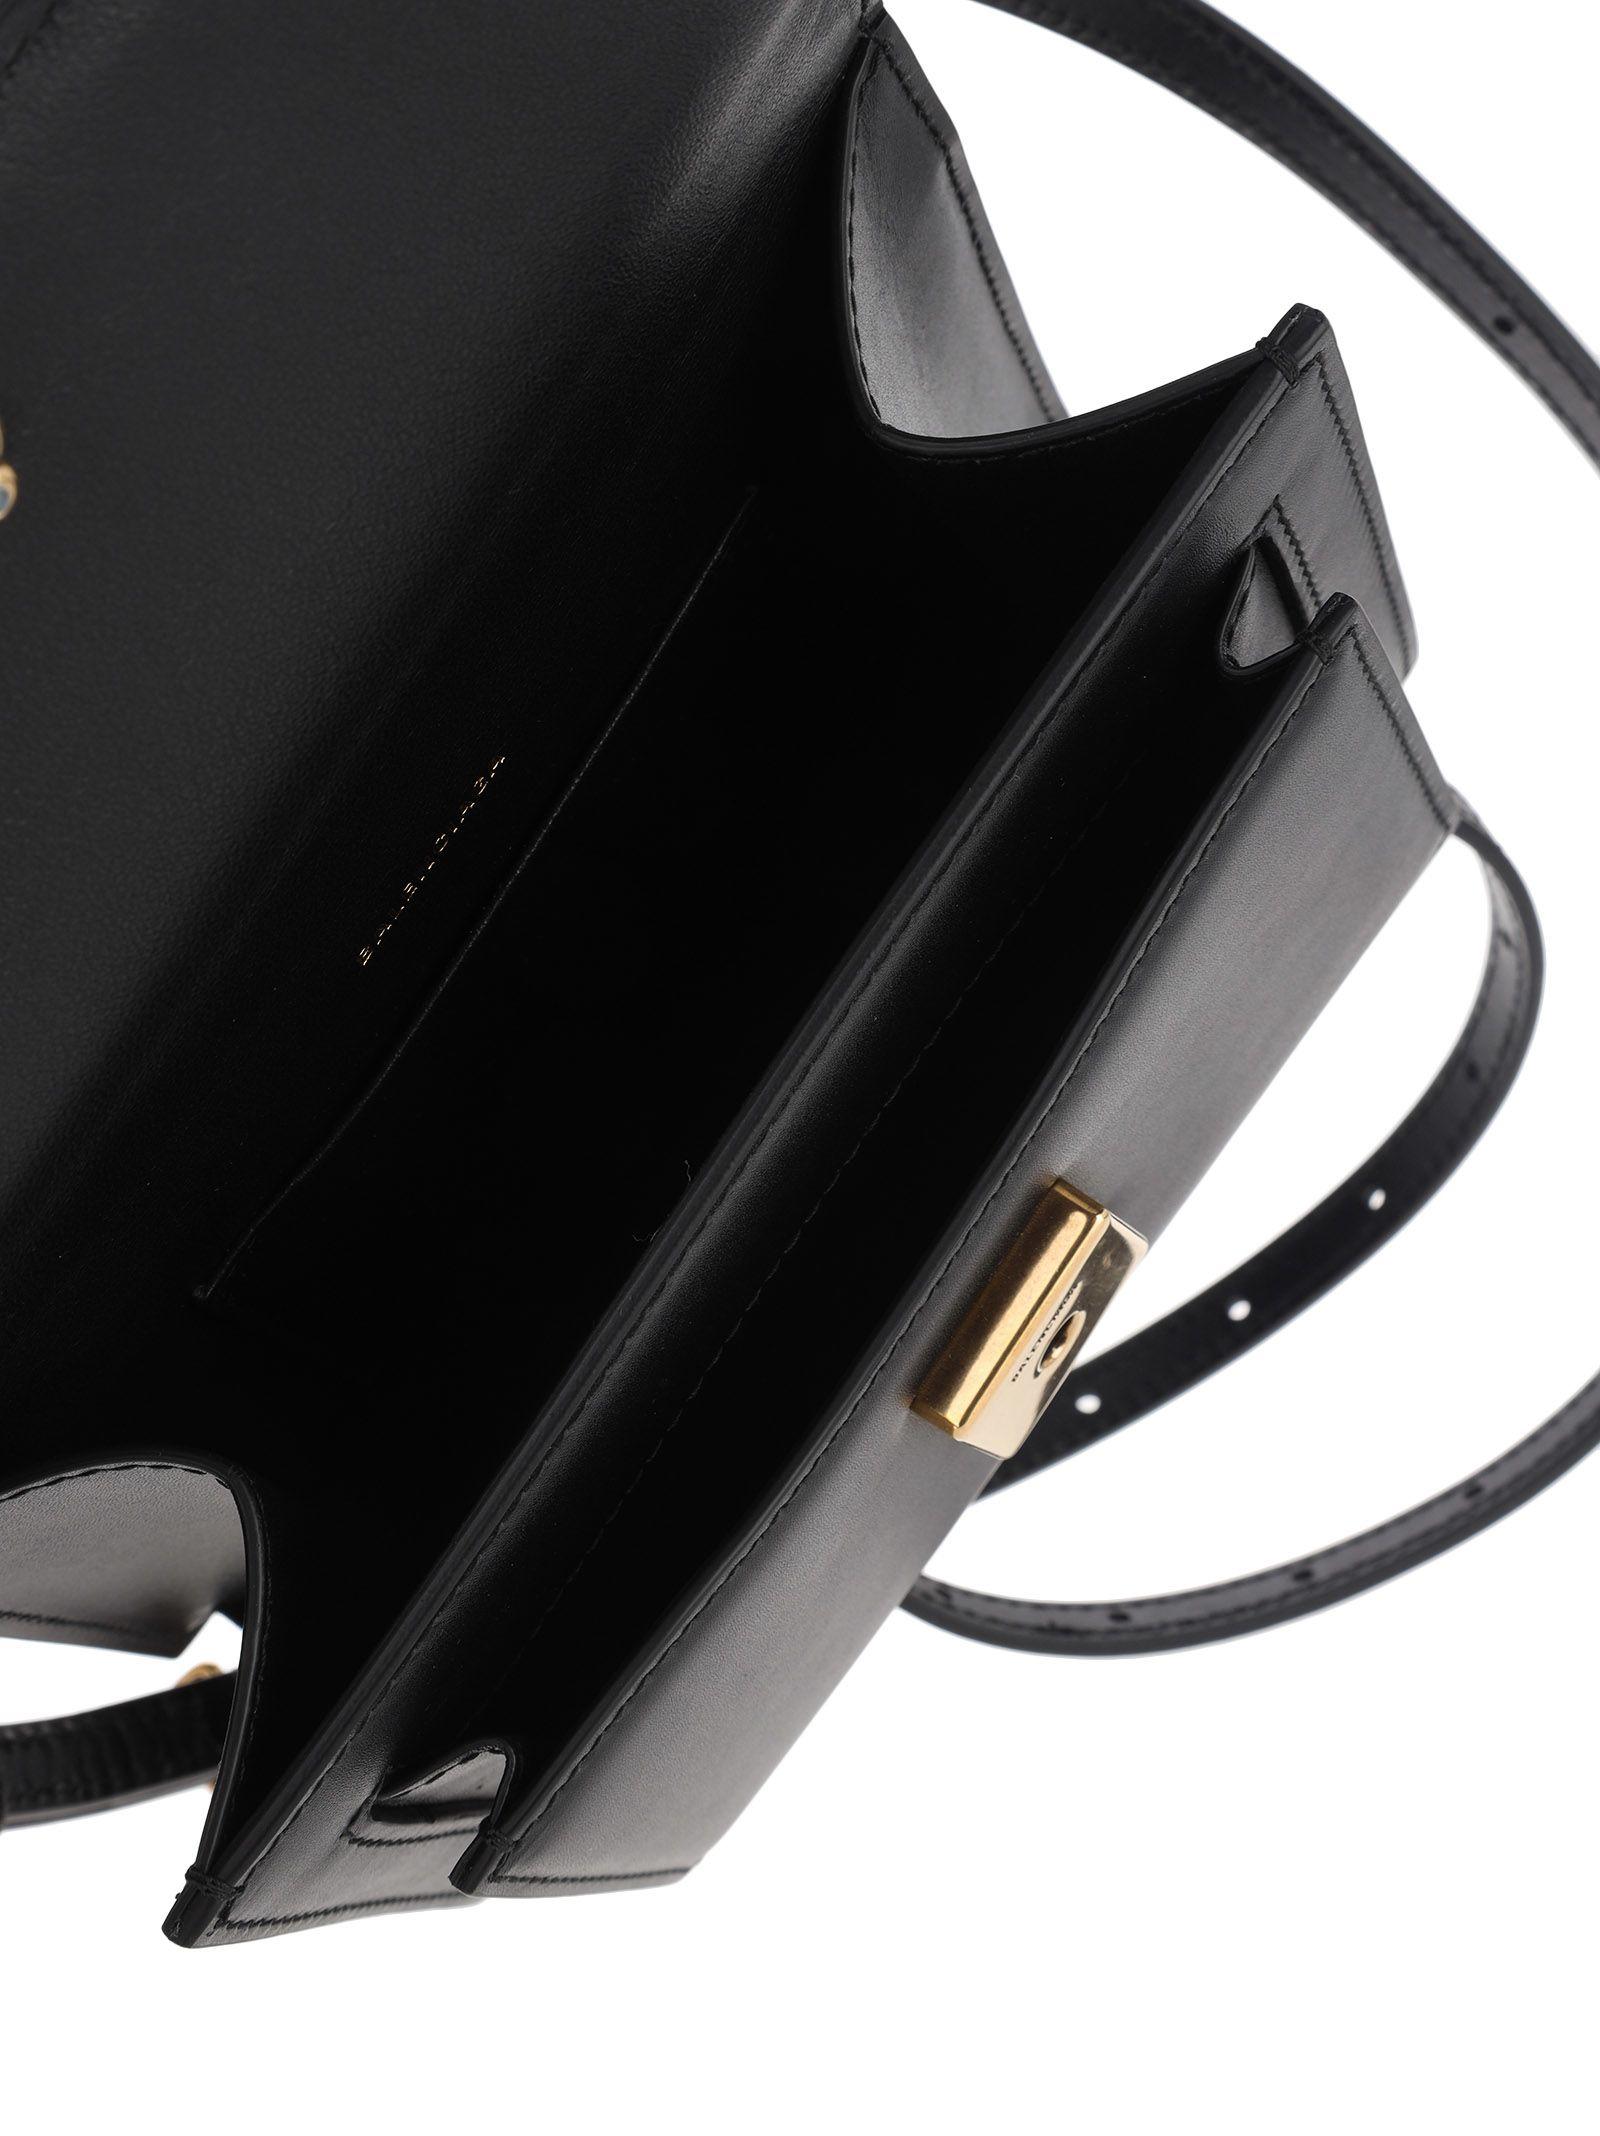 d2eaa15f9 Balenciaga Balenciaga Xs Sharp Tote Bag - BLACK - 10991304 | italist